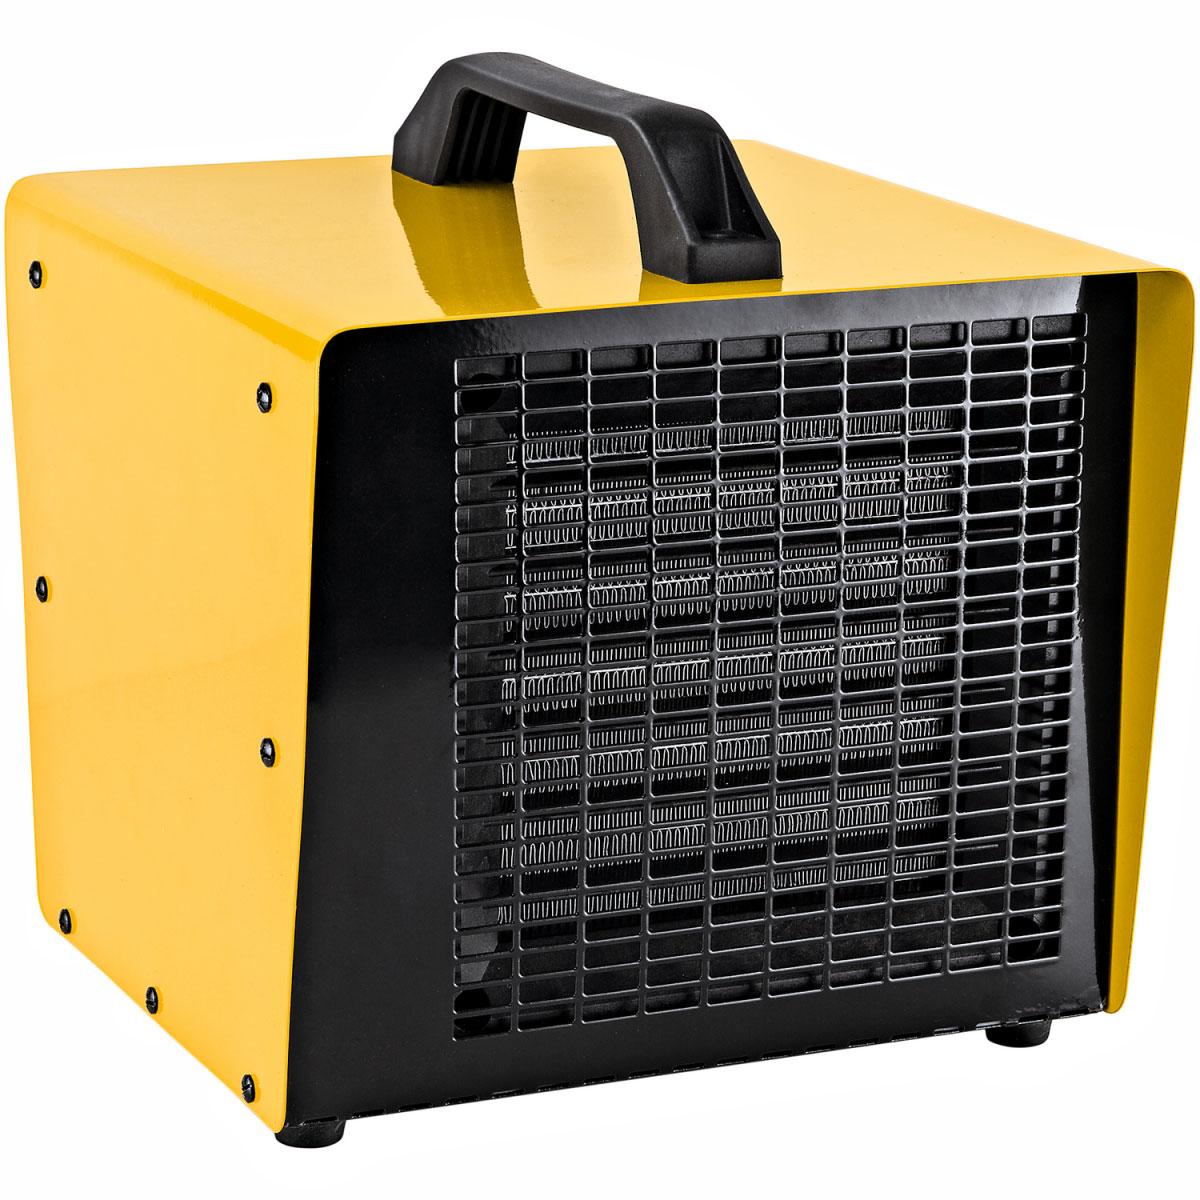 MyFireTool Industrie-Heizlüfter, 3000 Watt